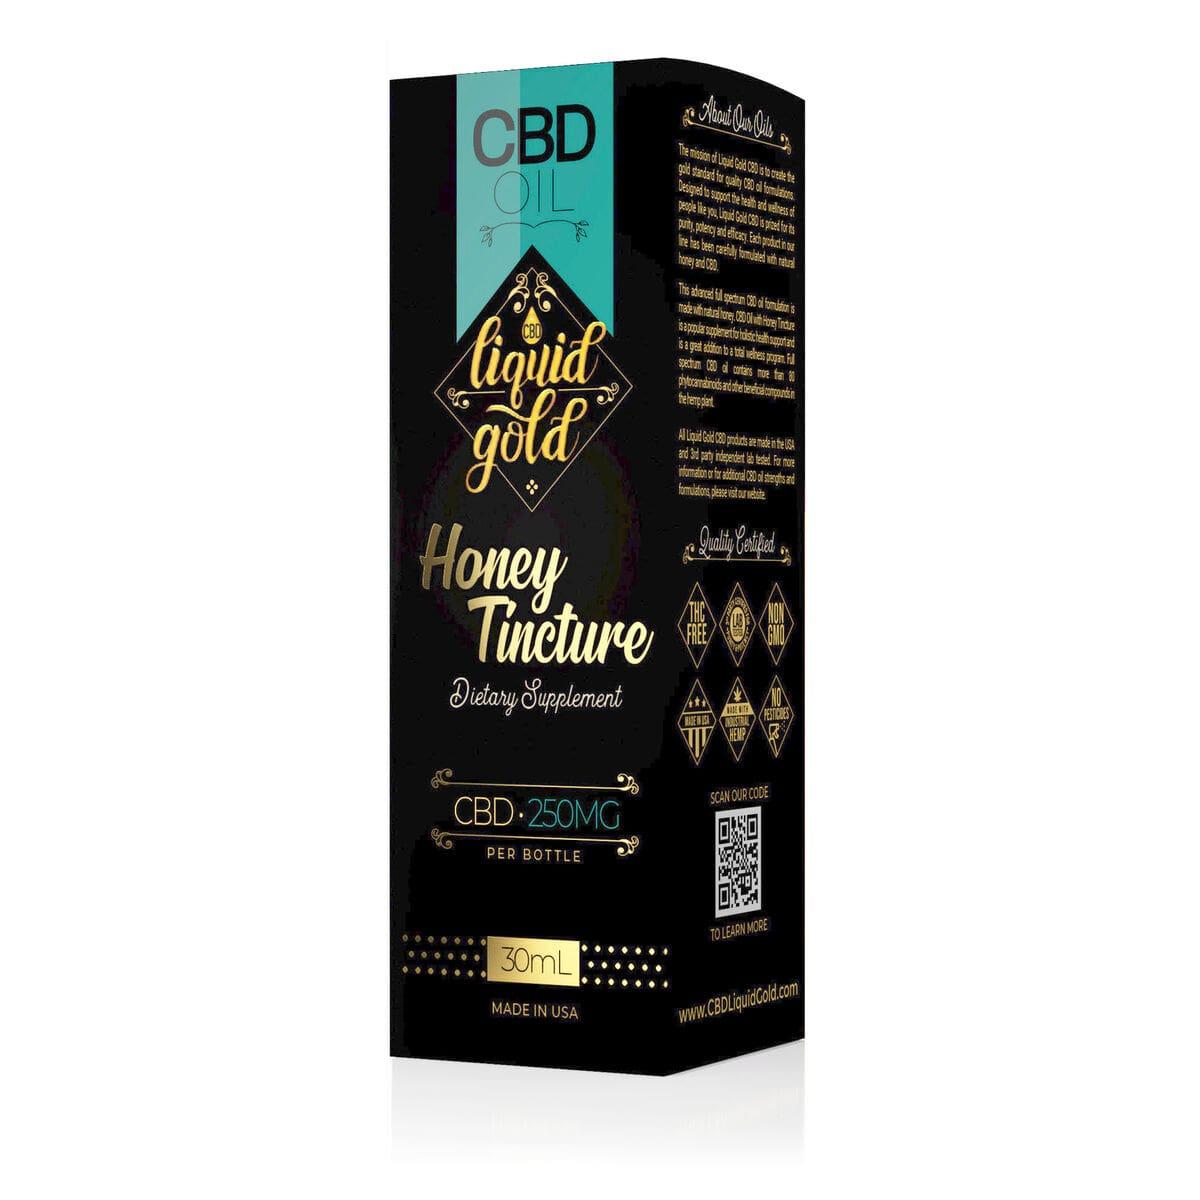 liquid-gold-cbd-oil-honey-tincture-250mg-30ml